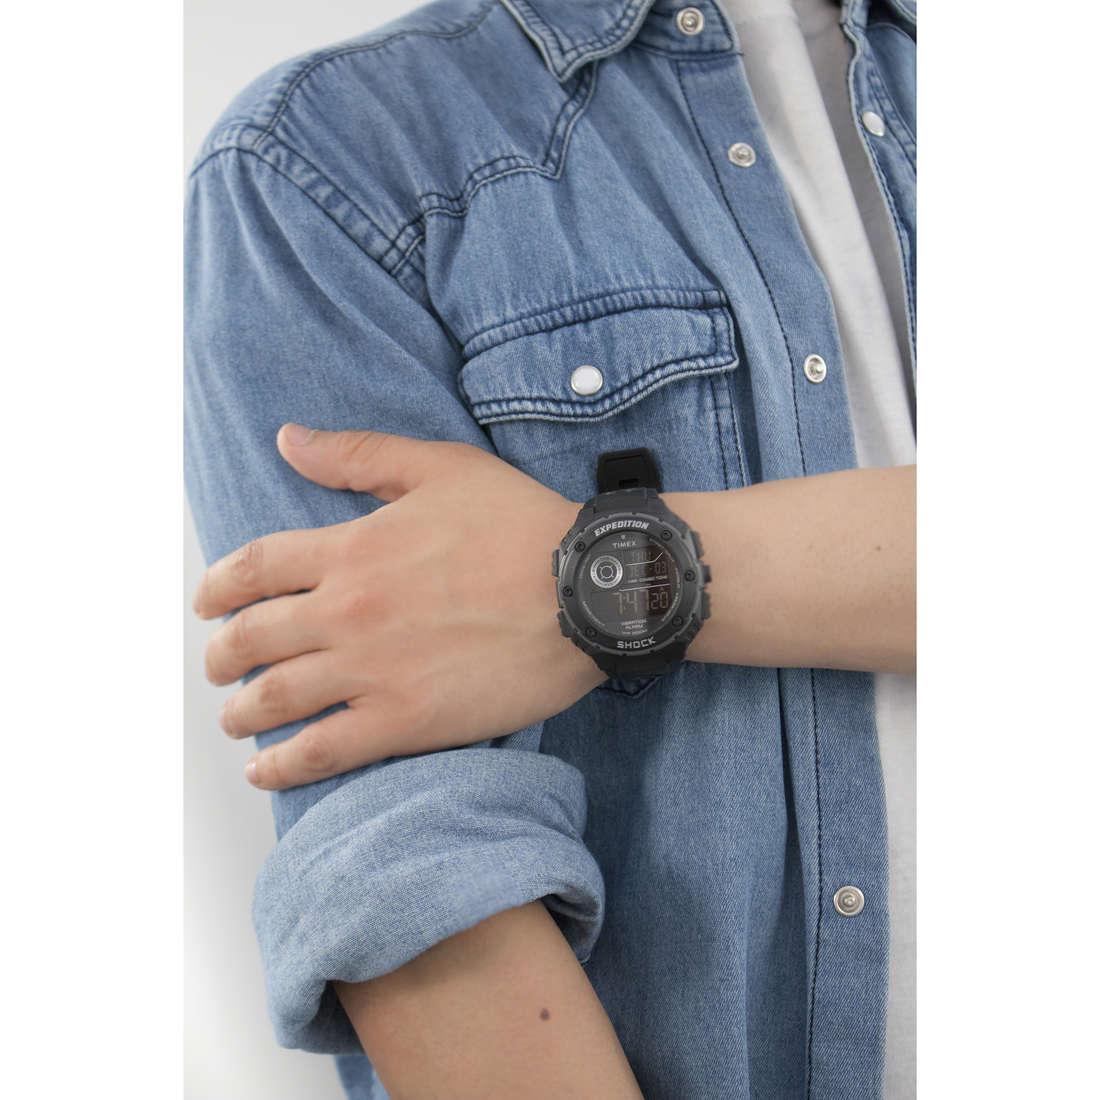 Timex cronografi Vibe Shock uomo T49983 indosso